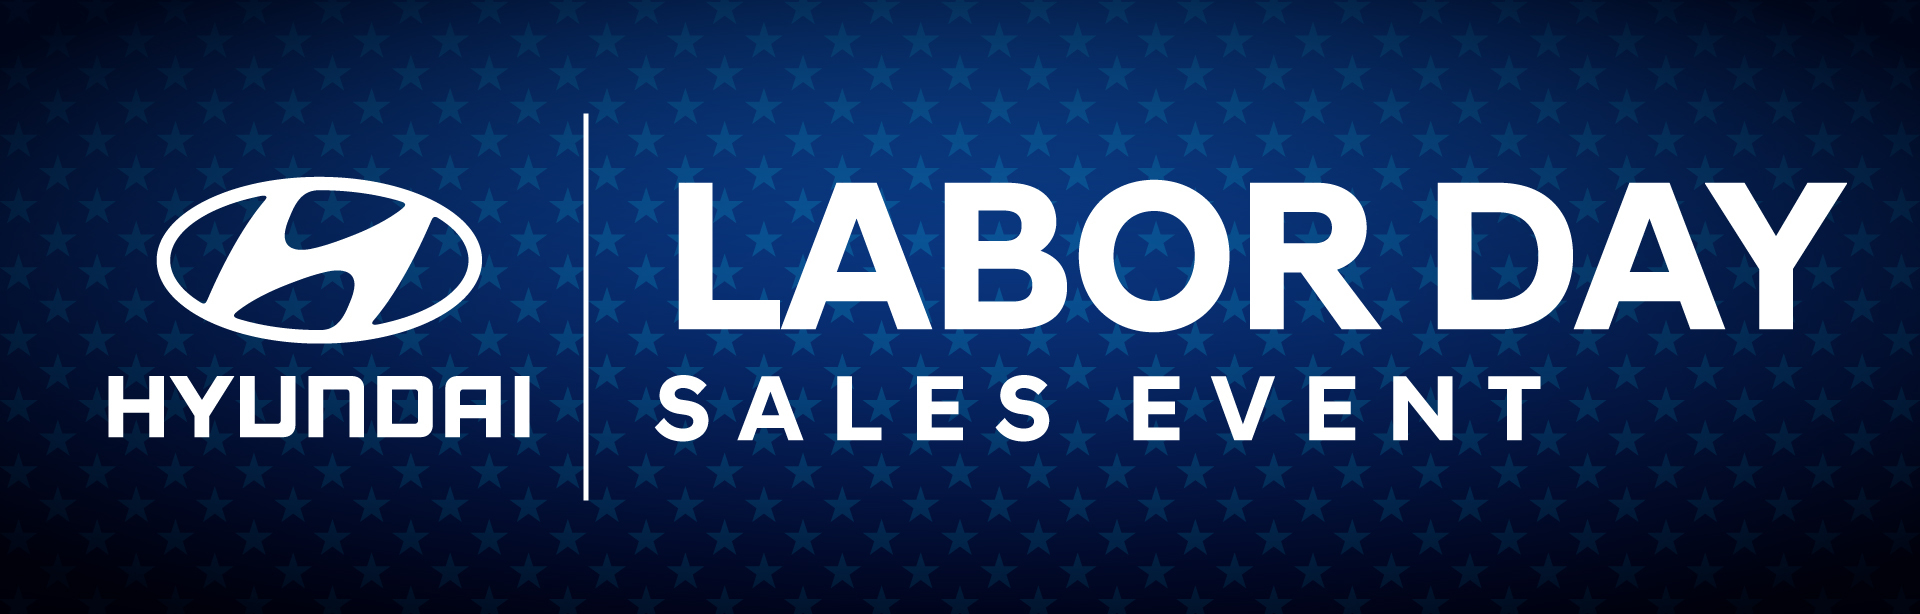 Hyundai labor day sale Lubbock TX